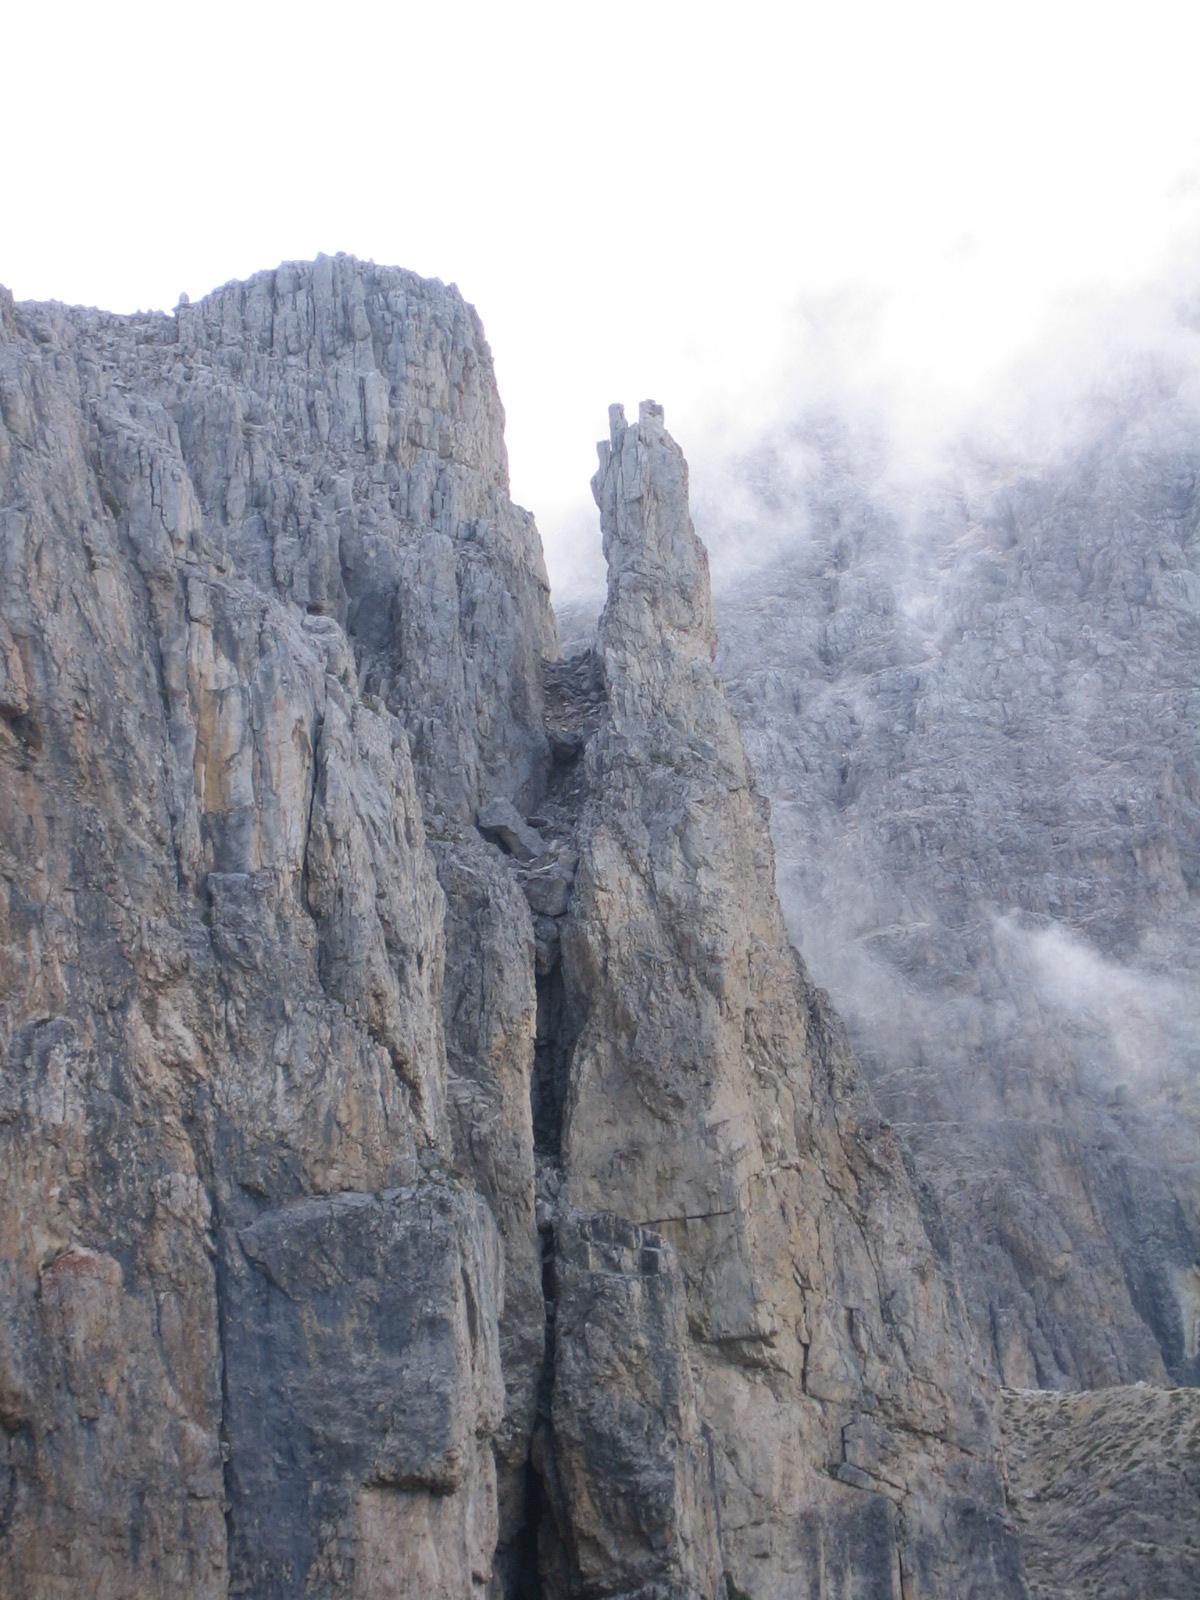 Rocks by Hrivalasse-stock